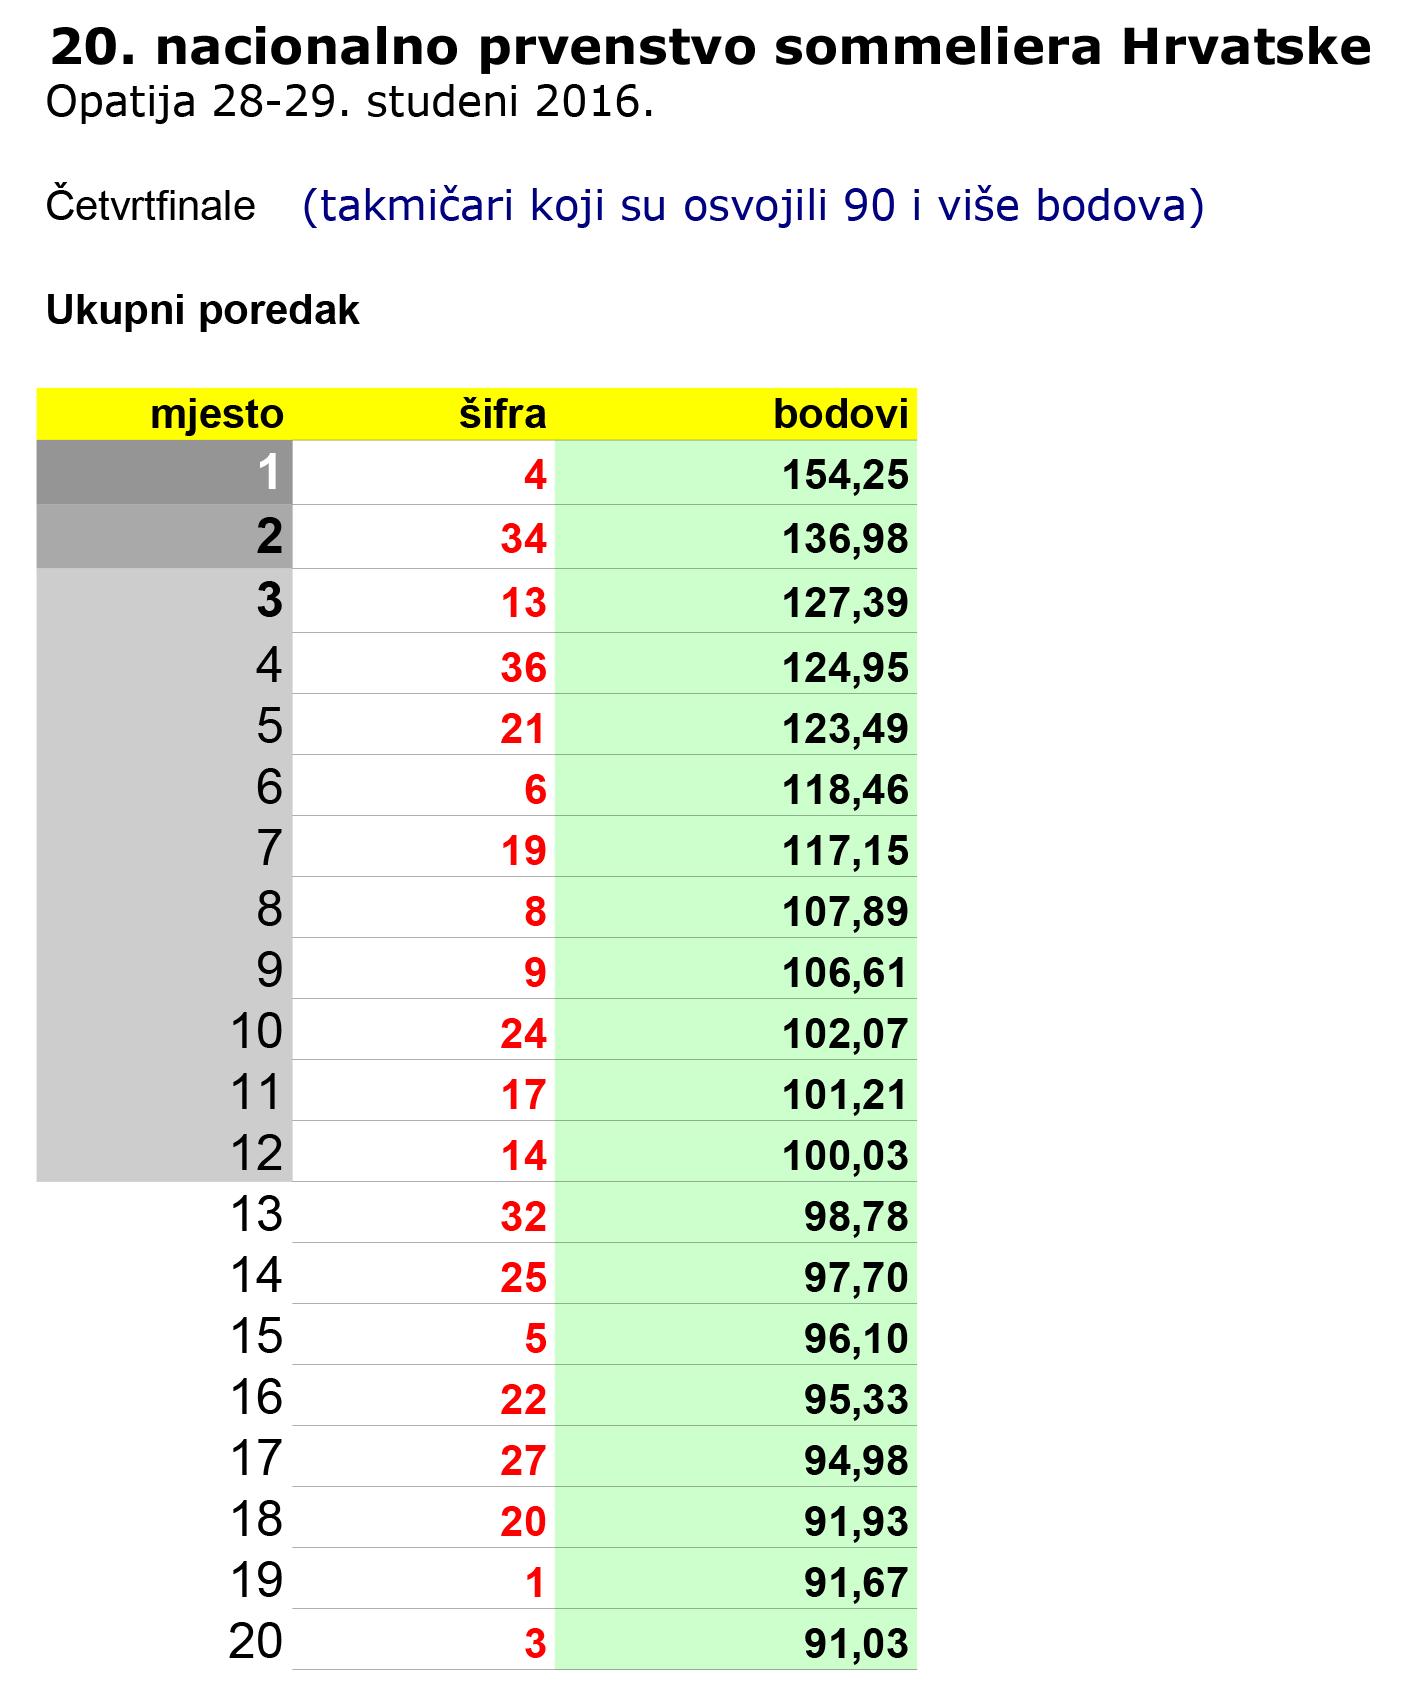 hsk-2016-rezultati-web-cetvrfinale